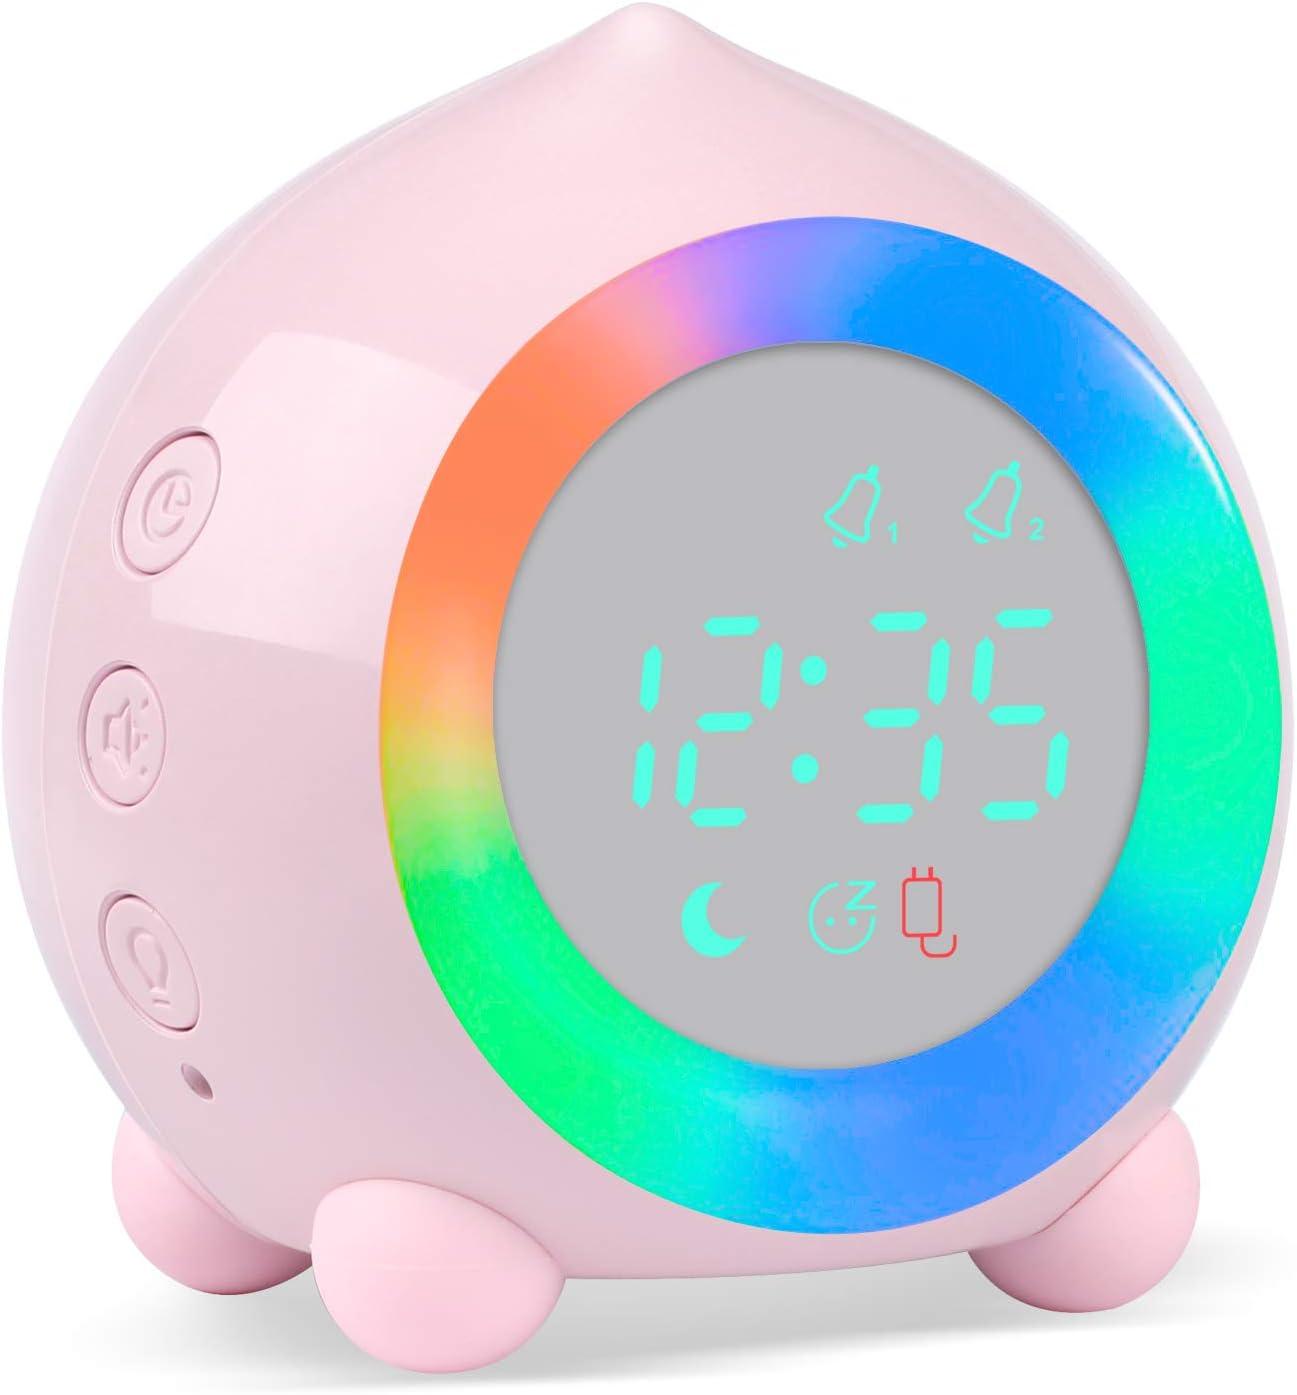 Alarm Clock Digital for Kids Sunrise Simulator Alarm Clock Bedside Mains Powered for Girls Boys Bedroom with LED Wake Up Light & Night Light Lamp Silent Alarm Clock (Pink)